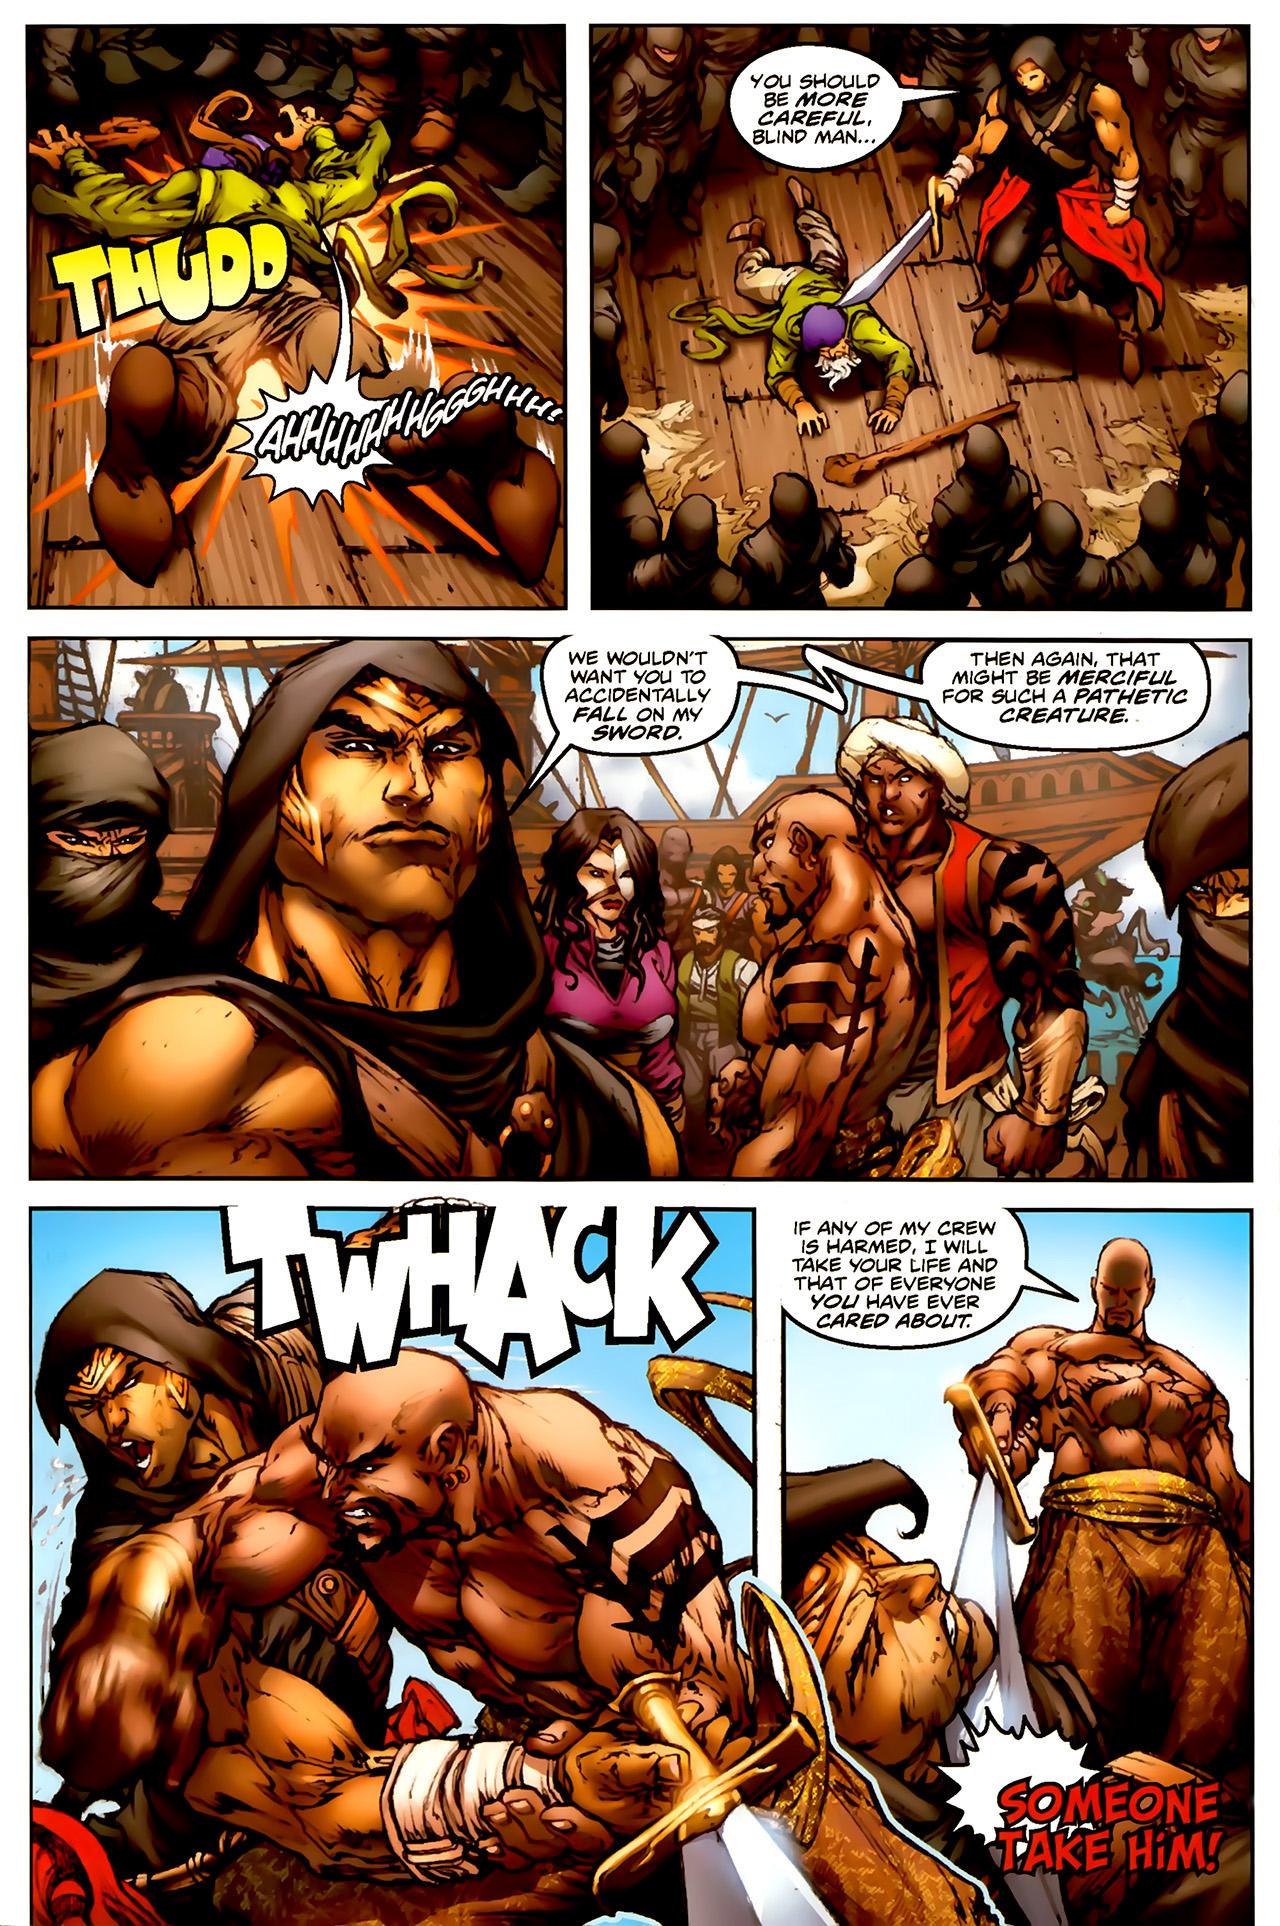 Read online 1001 Arabian Nights: The Adventures of Sinbad comic -  Issue #1 - 12